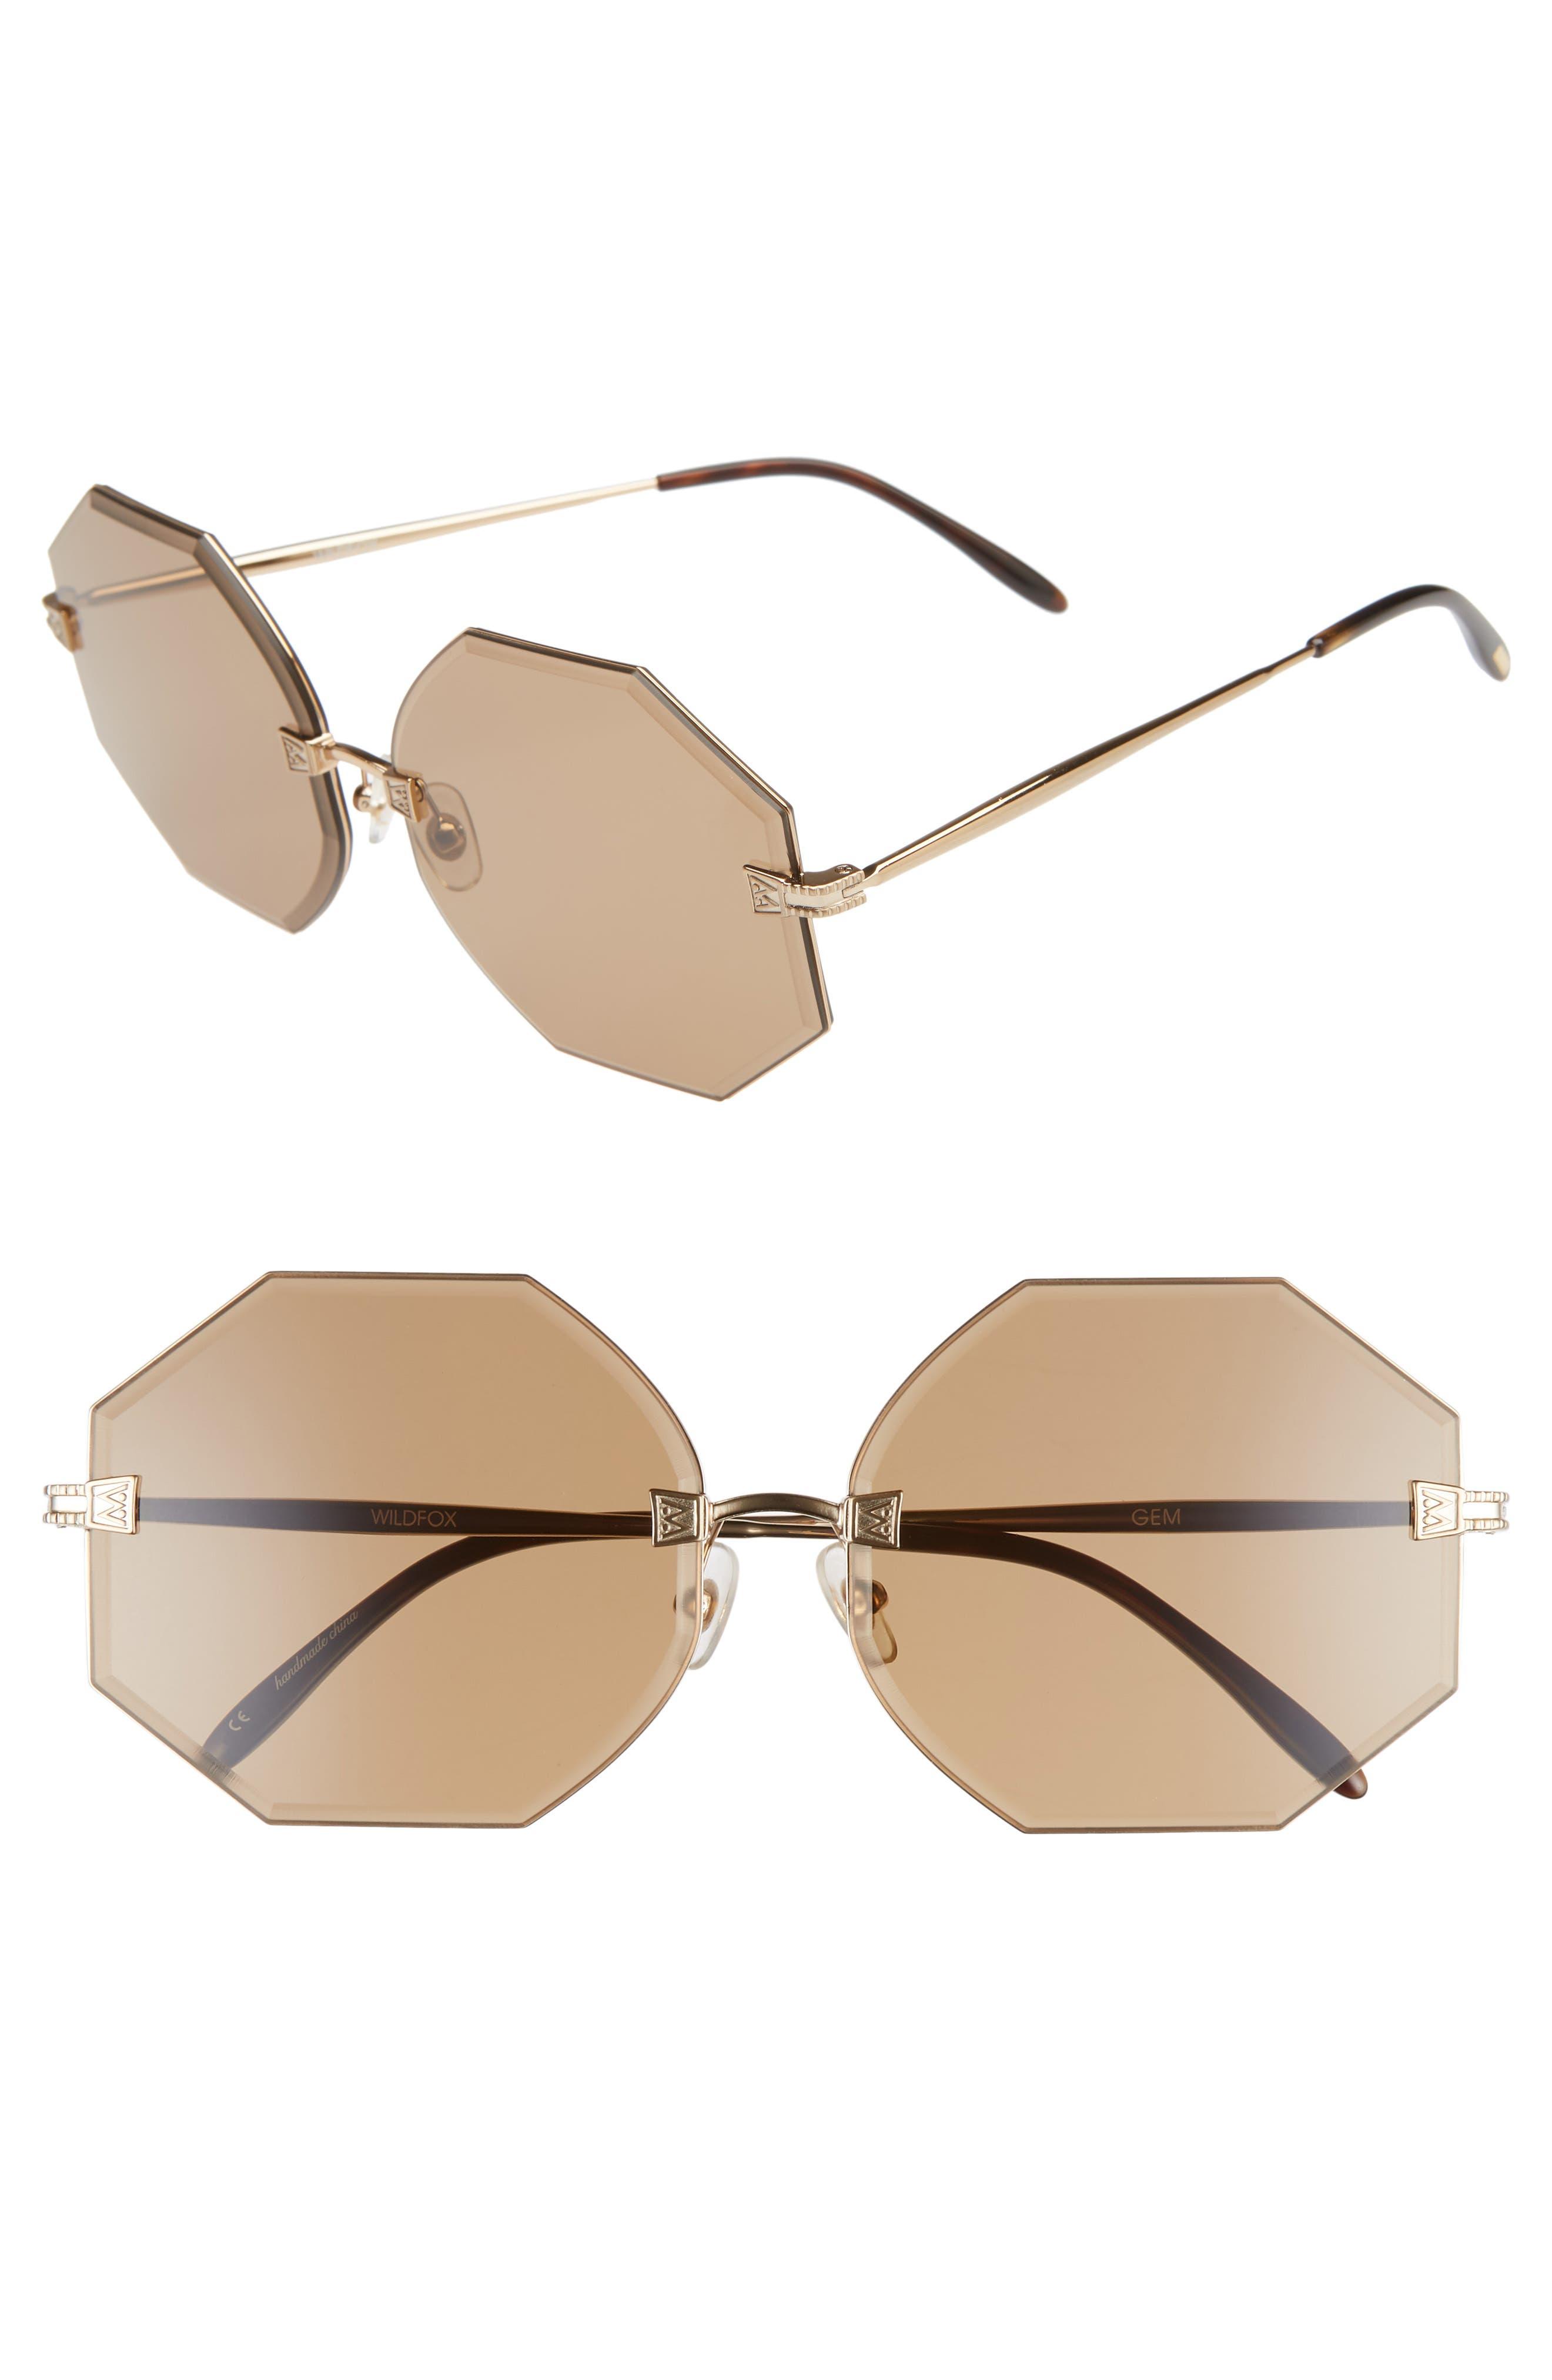 Gem 64mm Oversize Geometric Sunglasses,                         Main,                         color, ANTIQUE GOLD/ BROWN SOLID